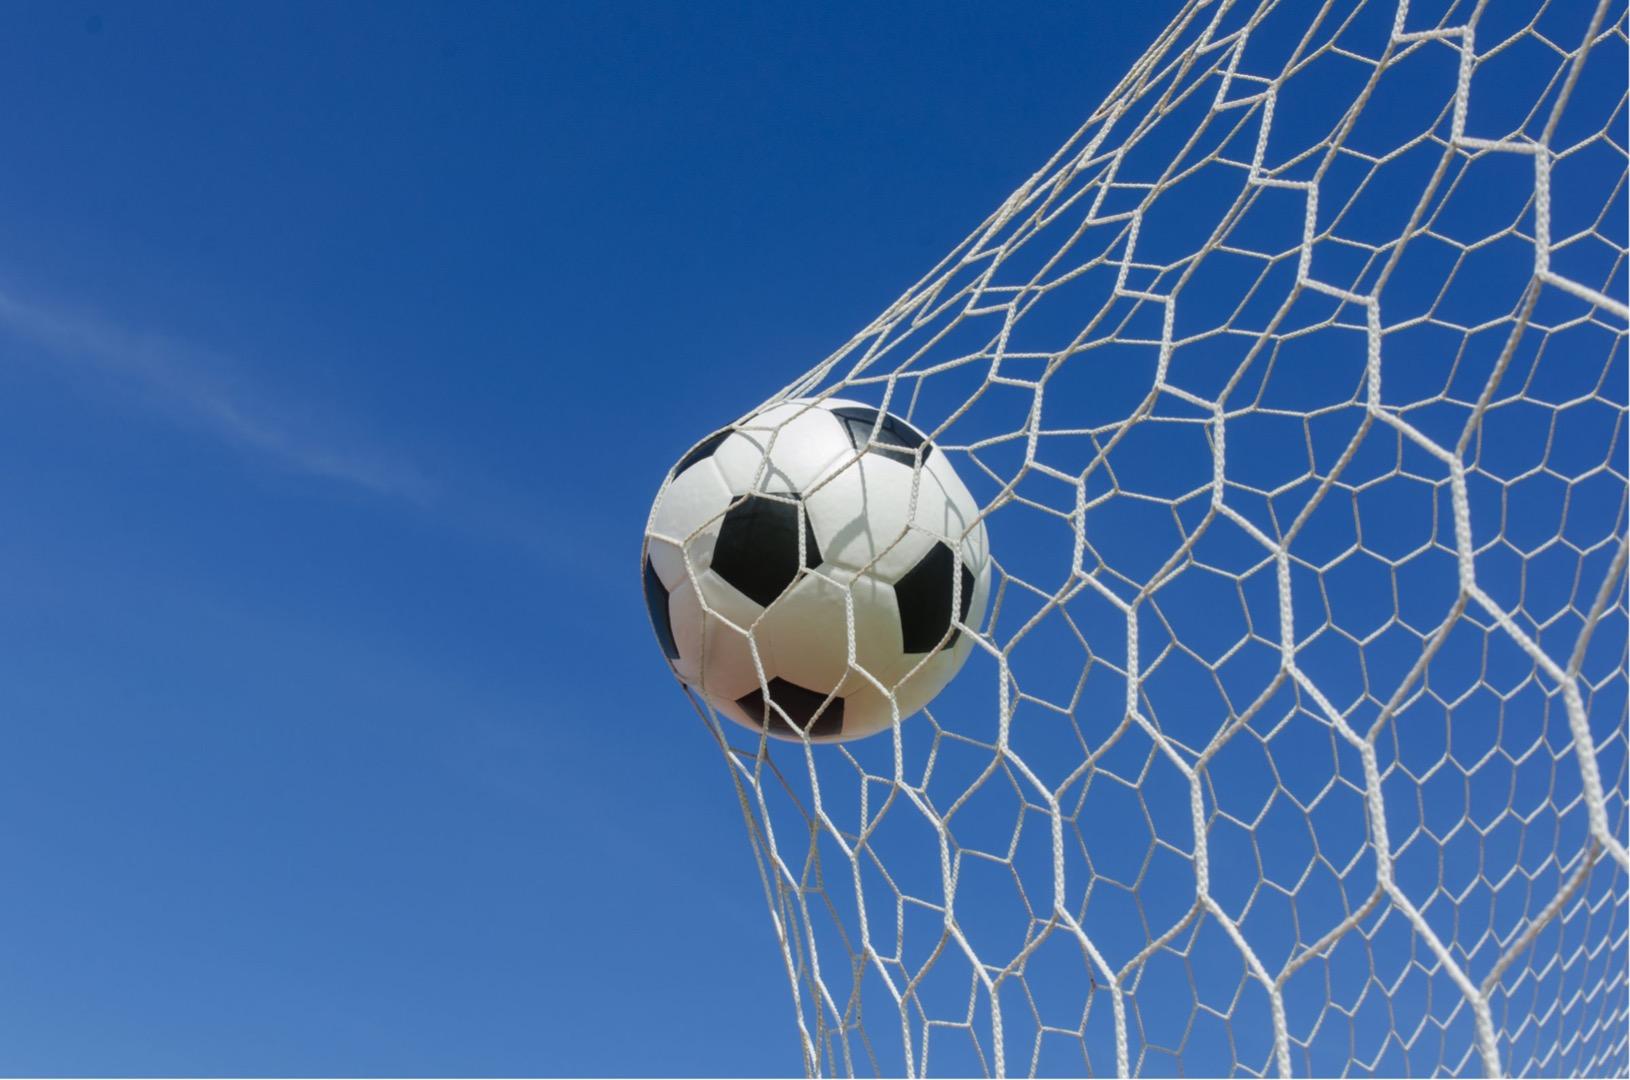 Soccer field image